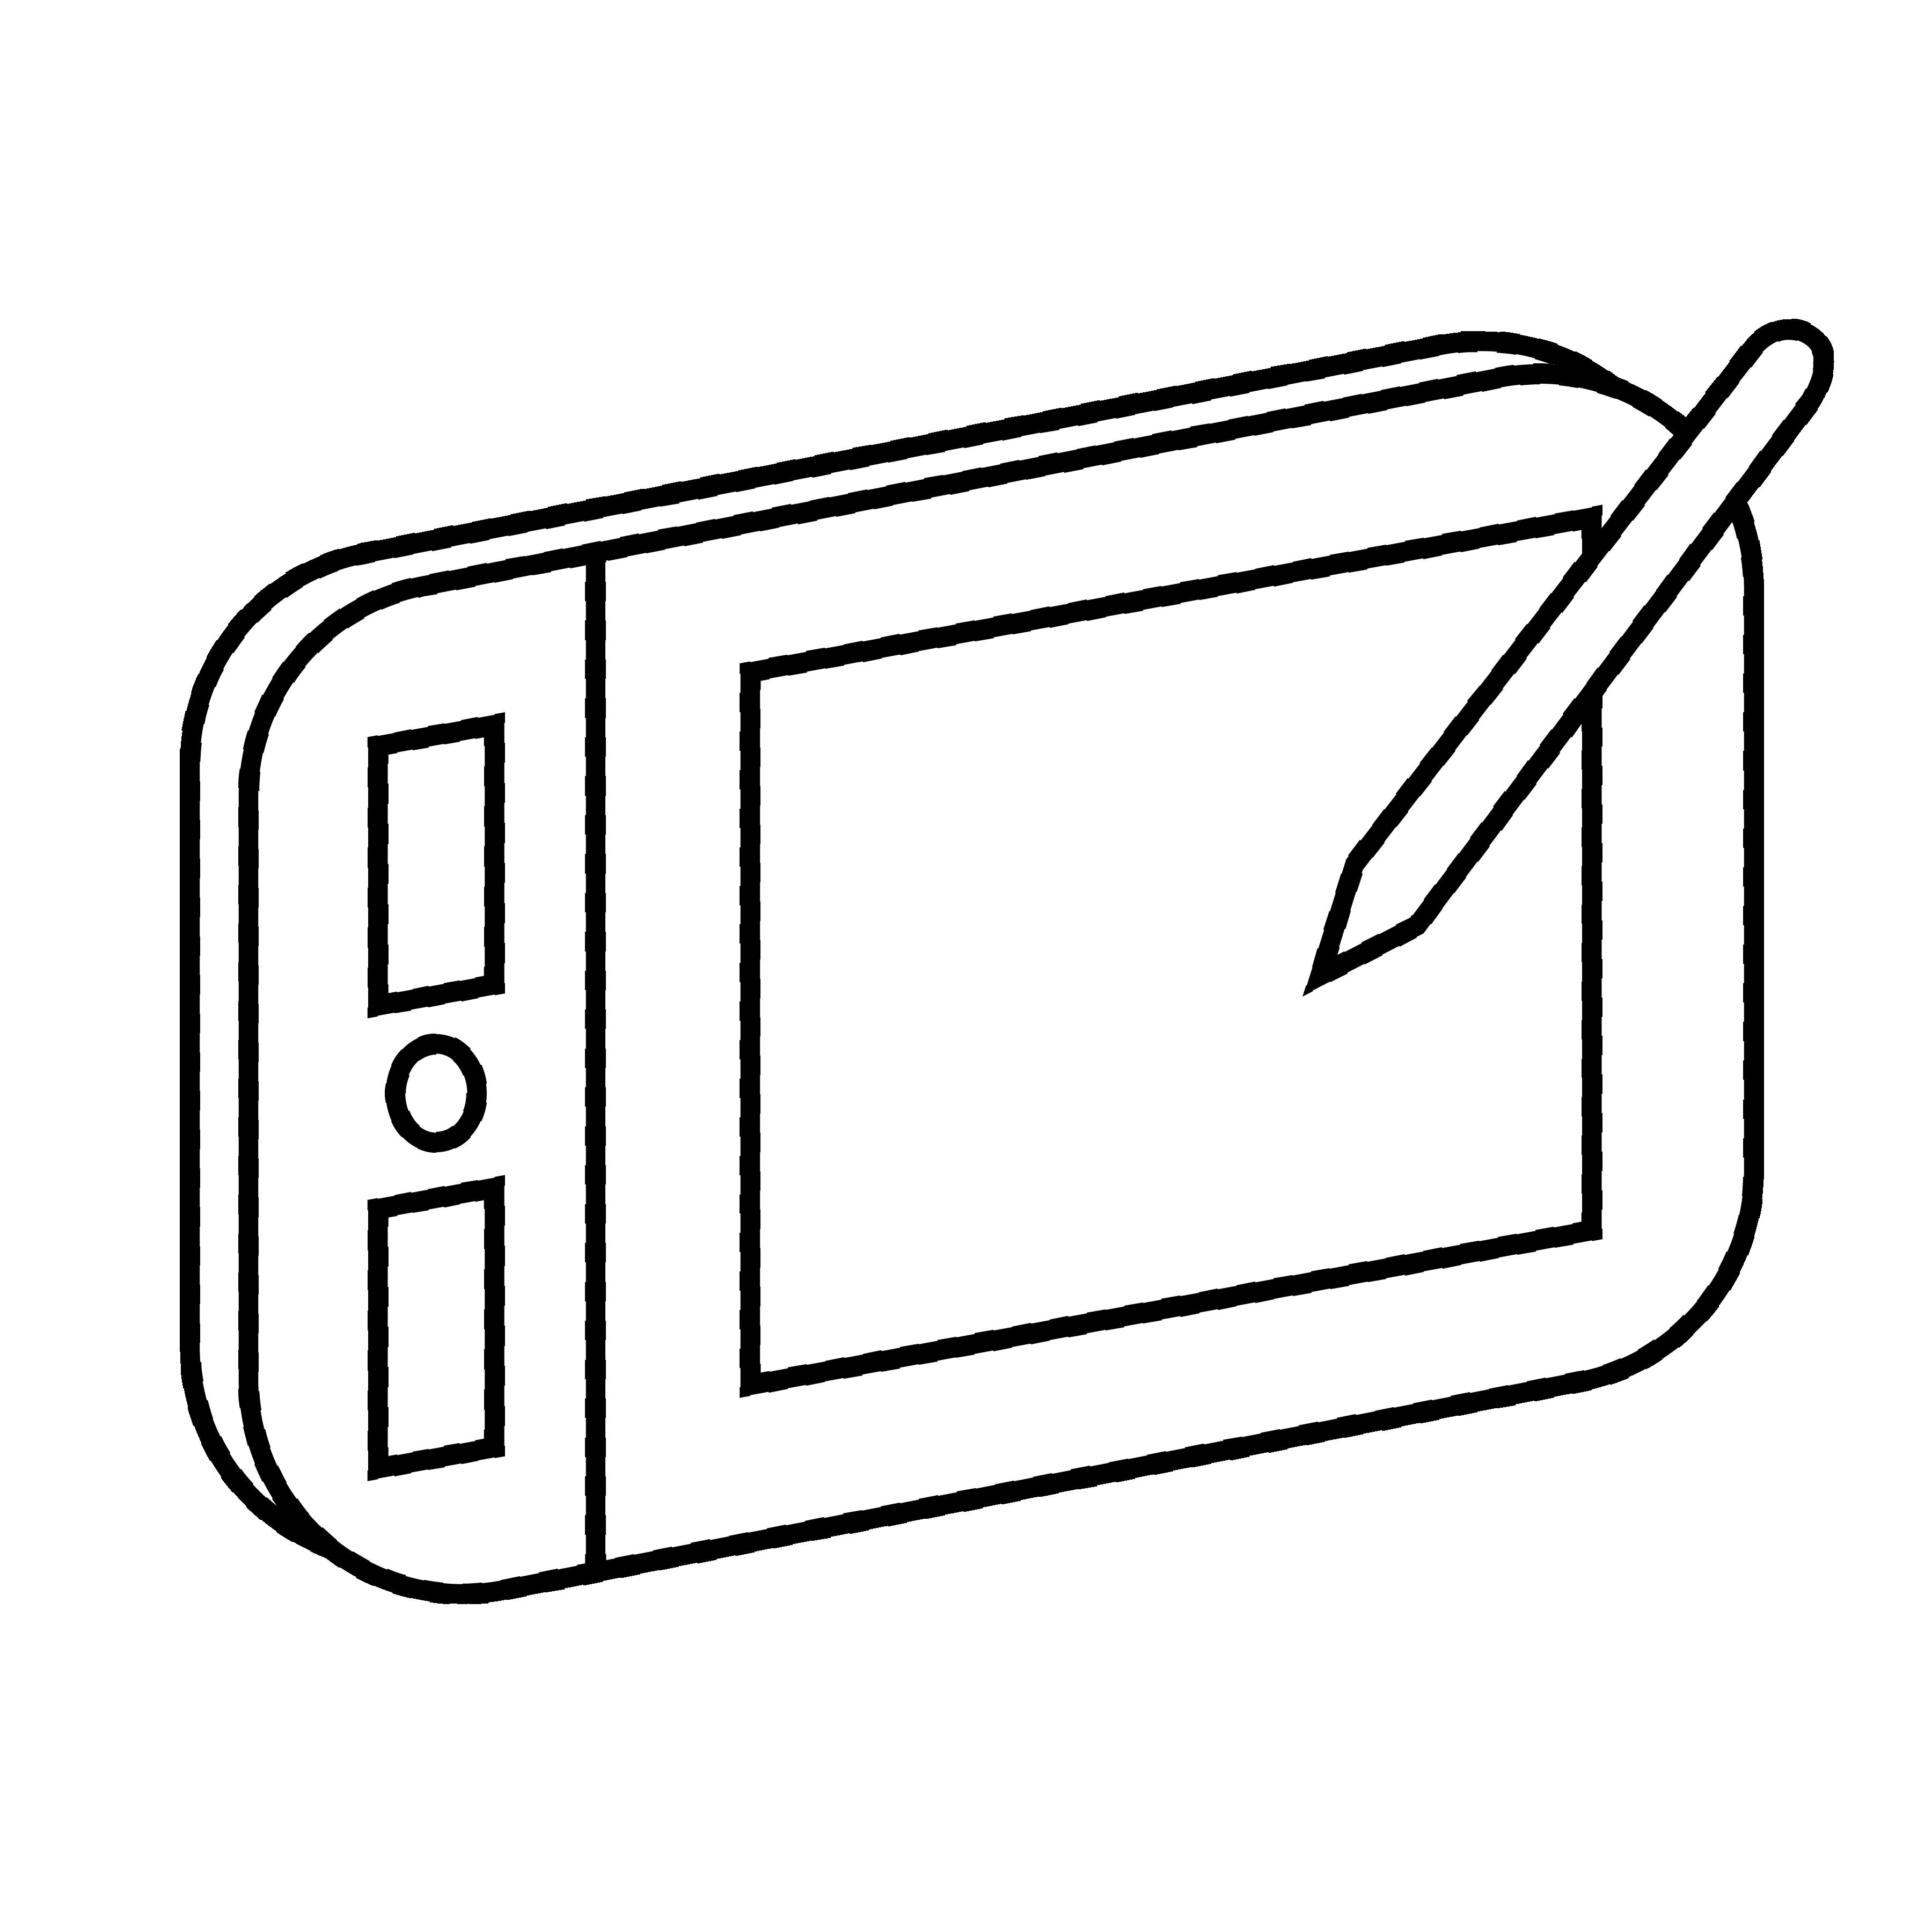 Image corresponding to Design service